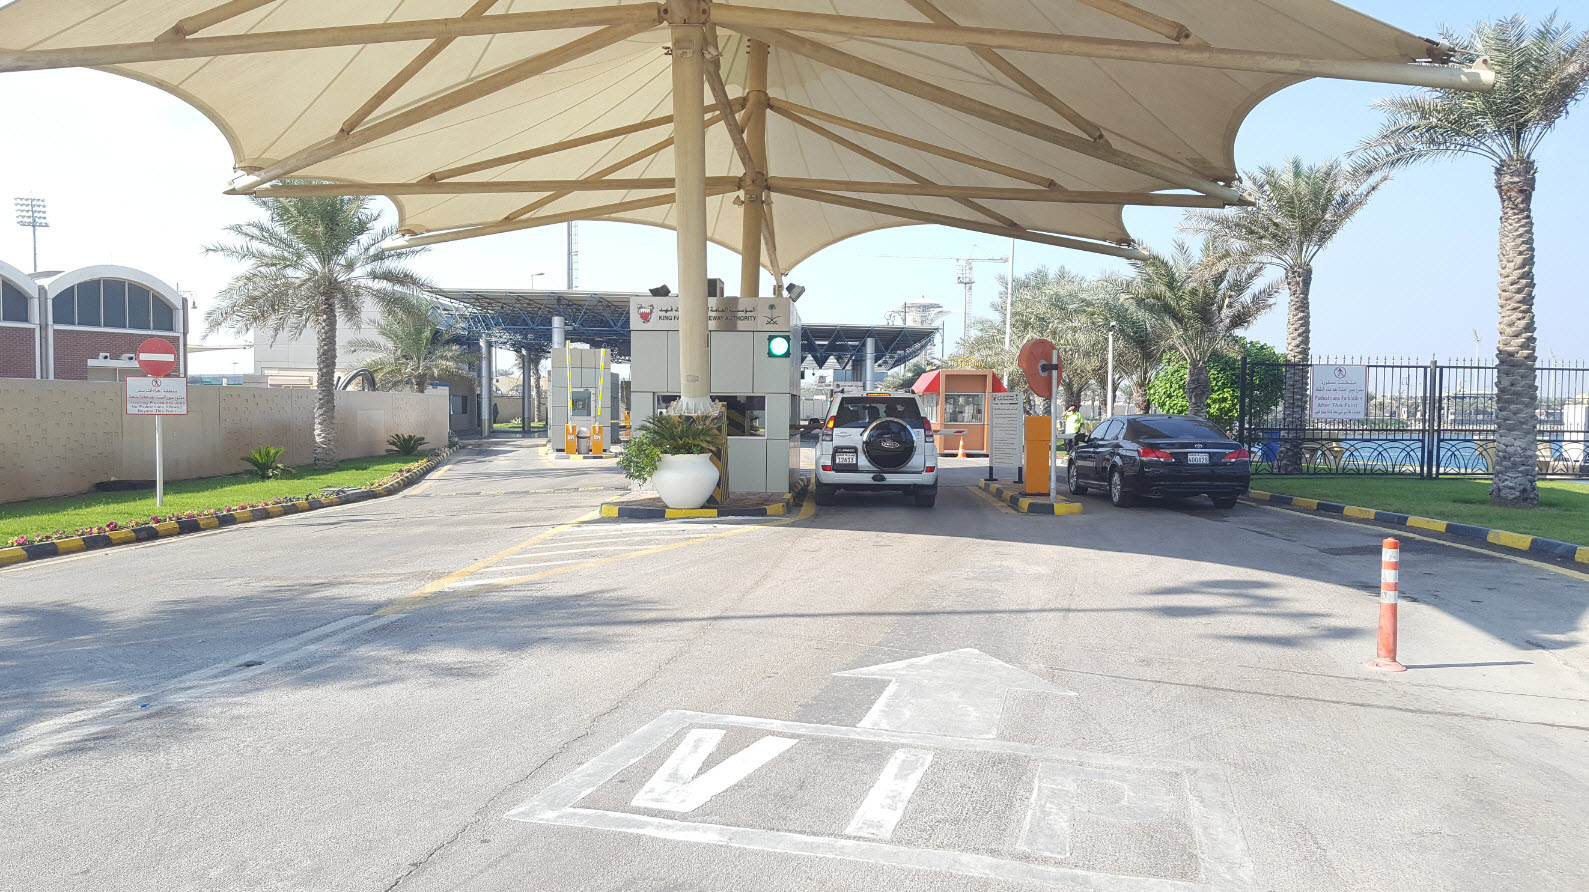 The King Fahd Causeway 4